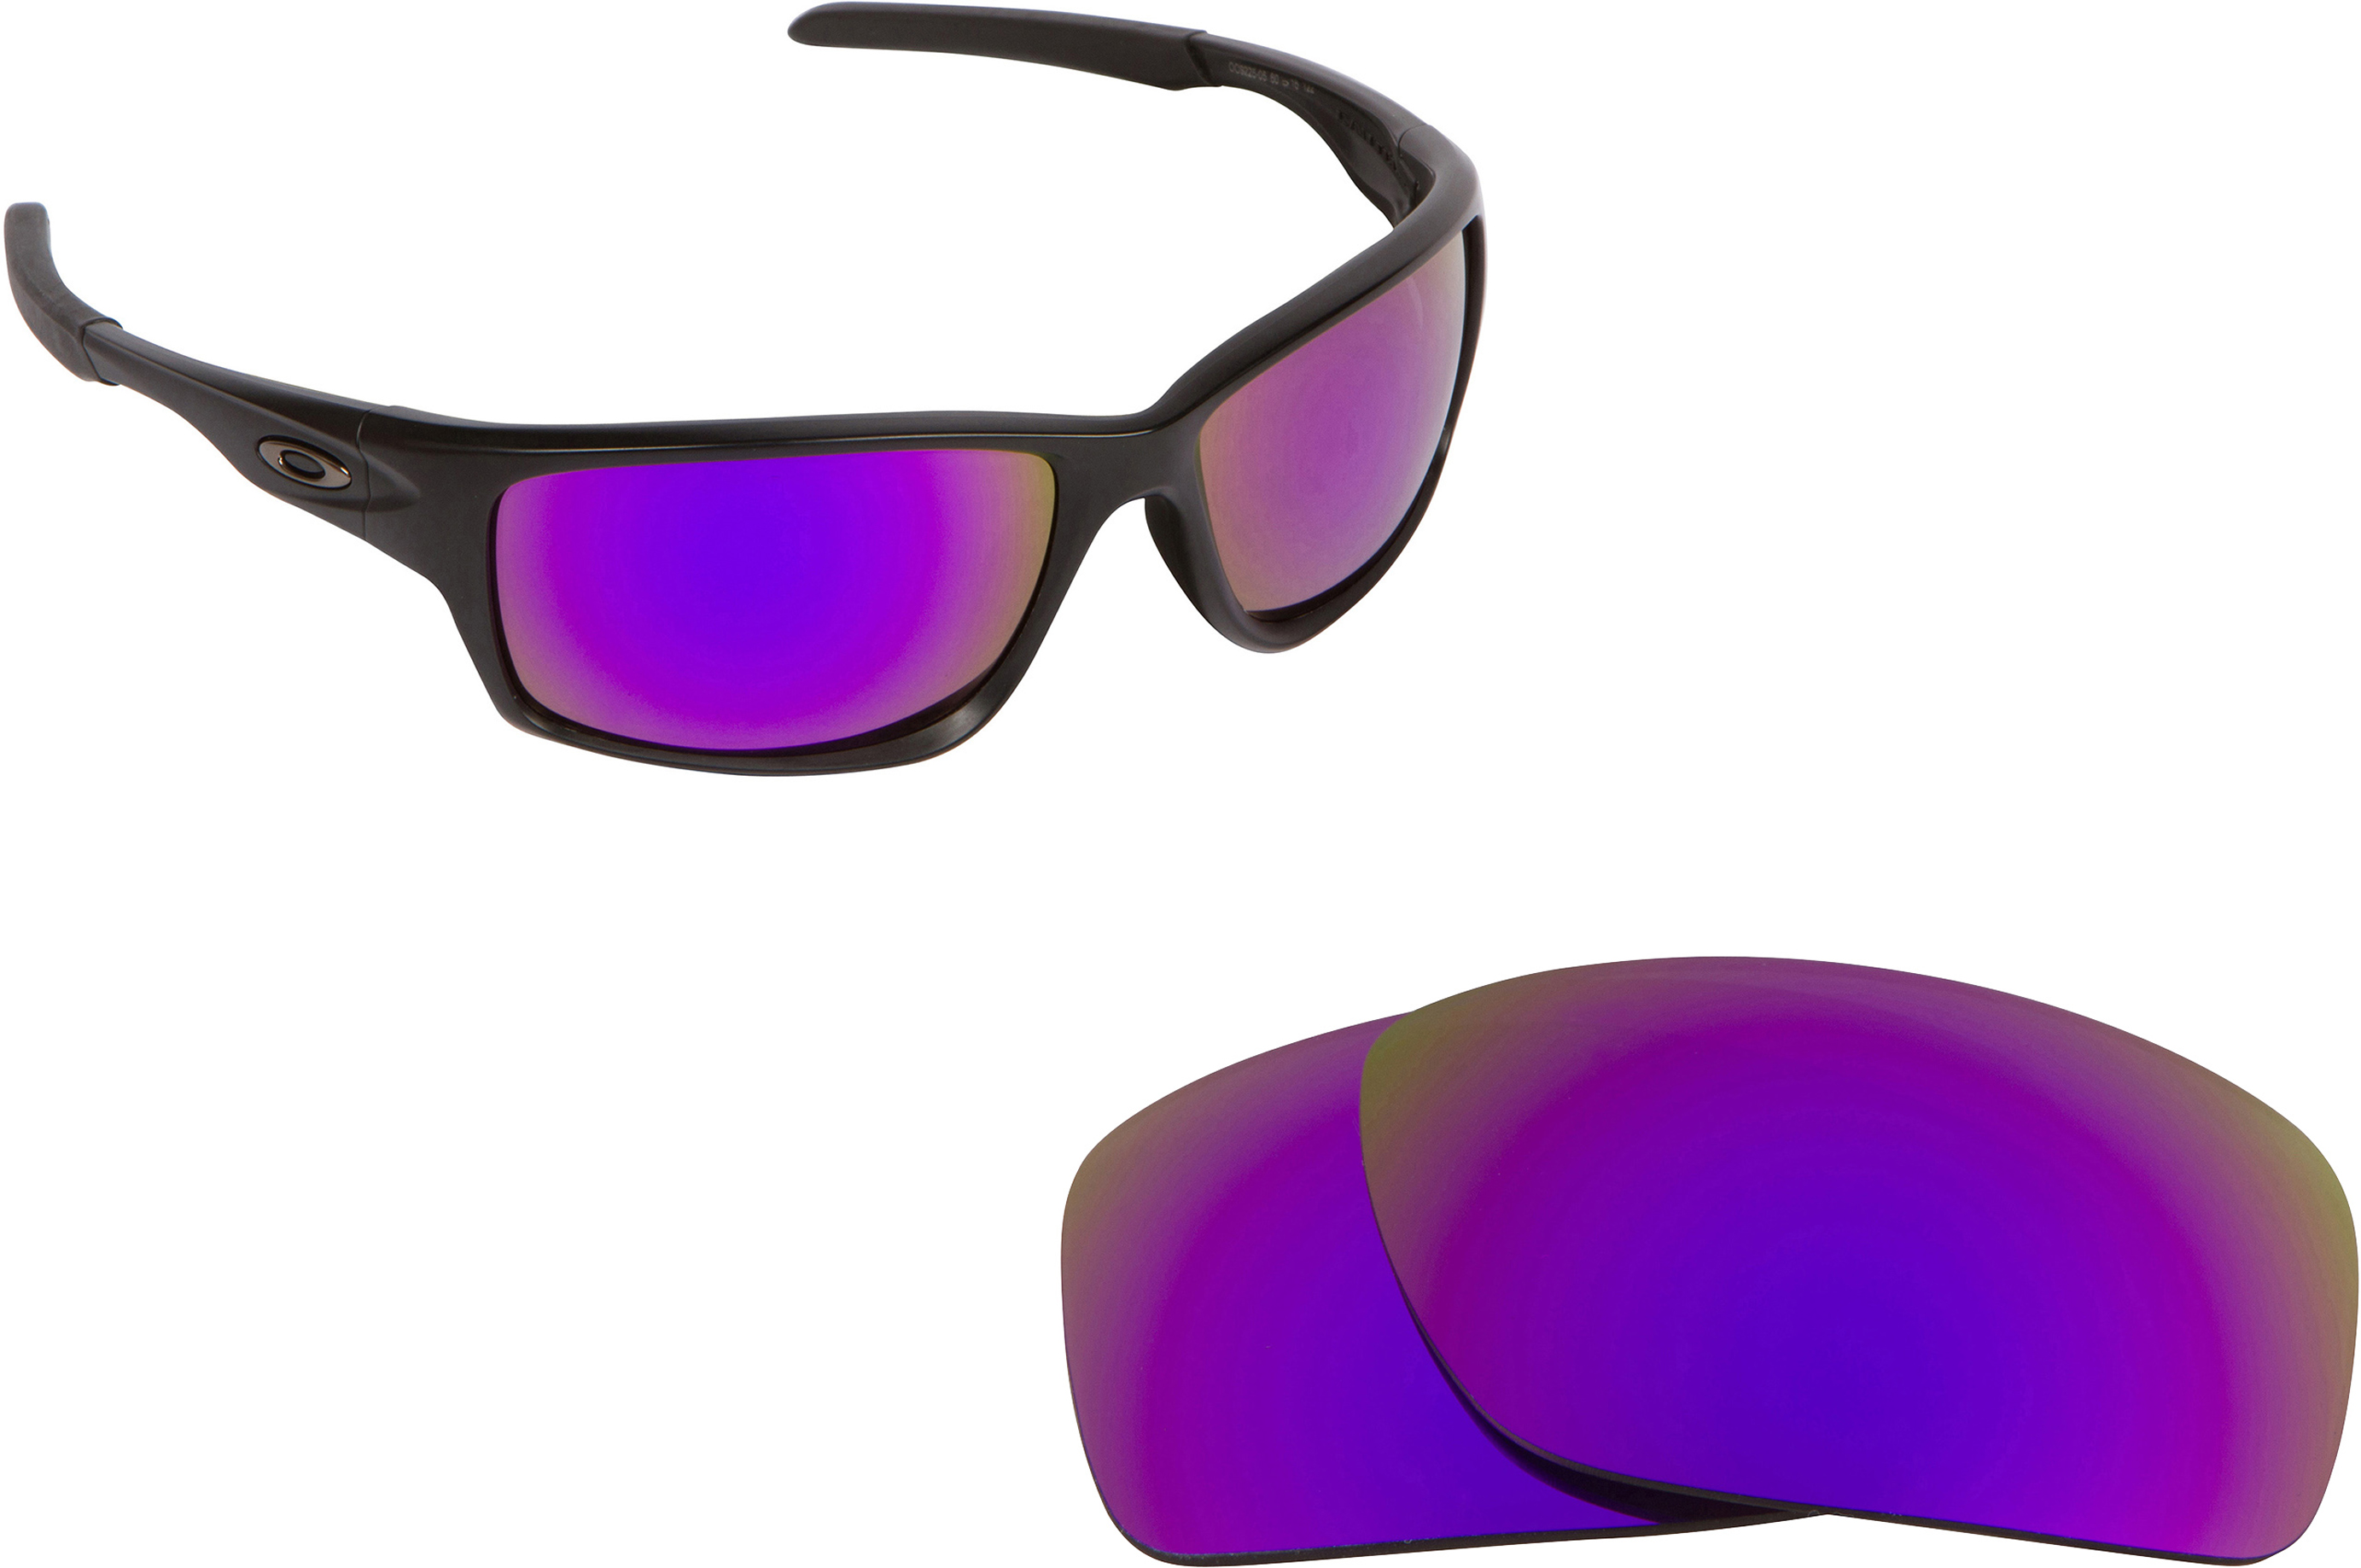 oakley 4 1 squared polarized lenses  polycarbonate lenses